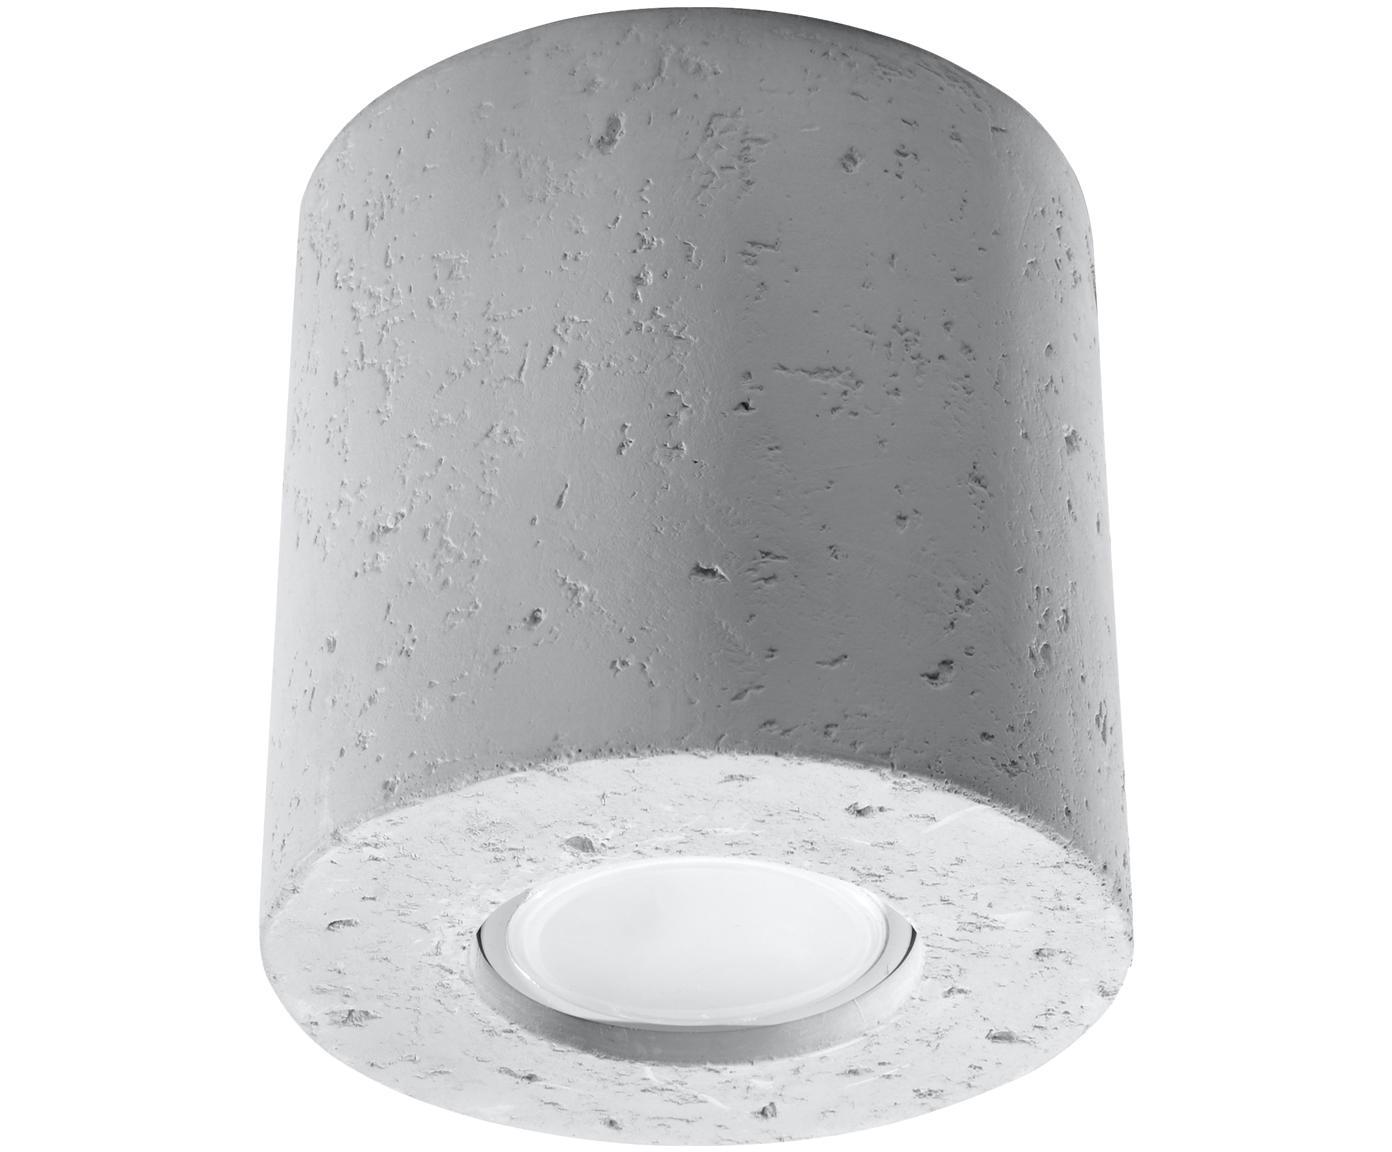 Foco Roda, Cemento, Gris claro, Ø 10 x Al 12 cm